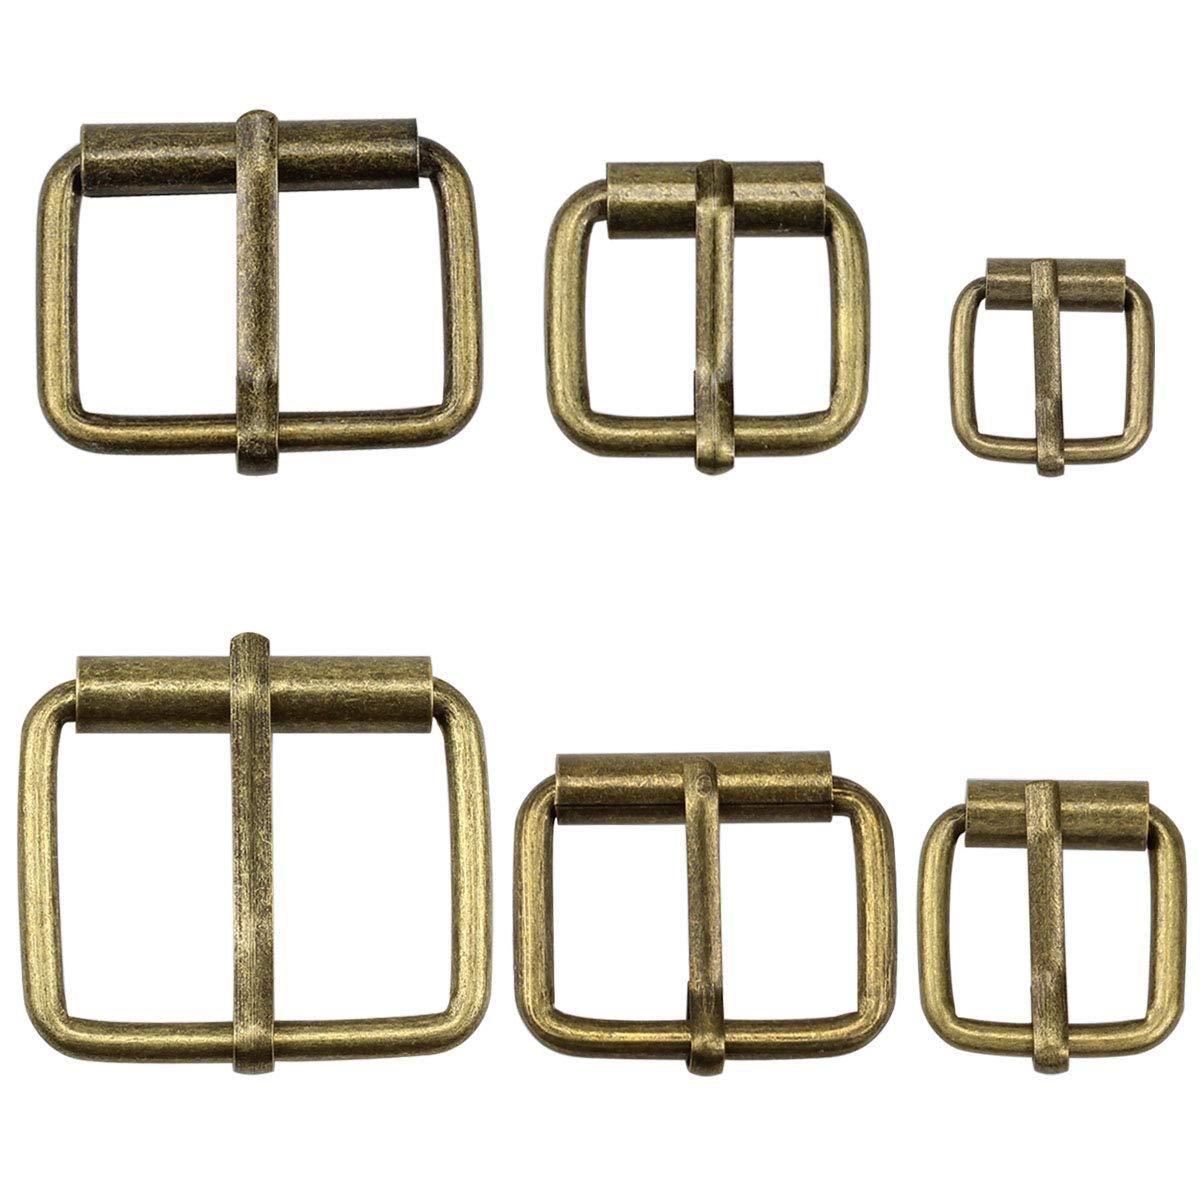 20mm Belt Buckles,adjuster buckle,roller pin buckle,metal belt buckle,bag hardware,strap buckle